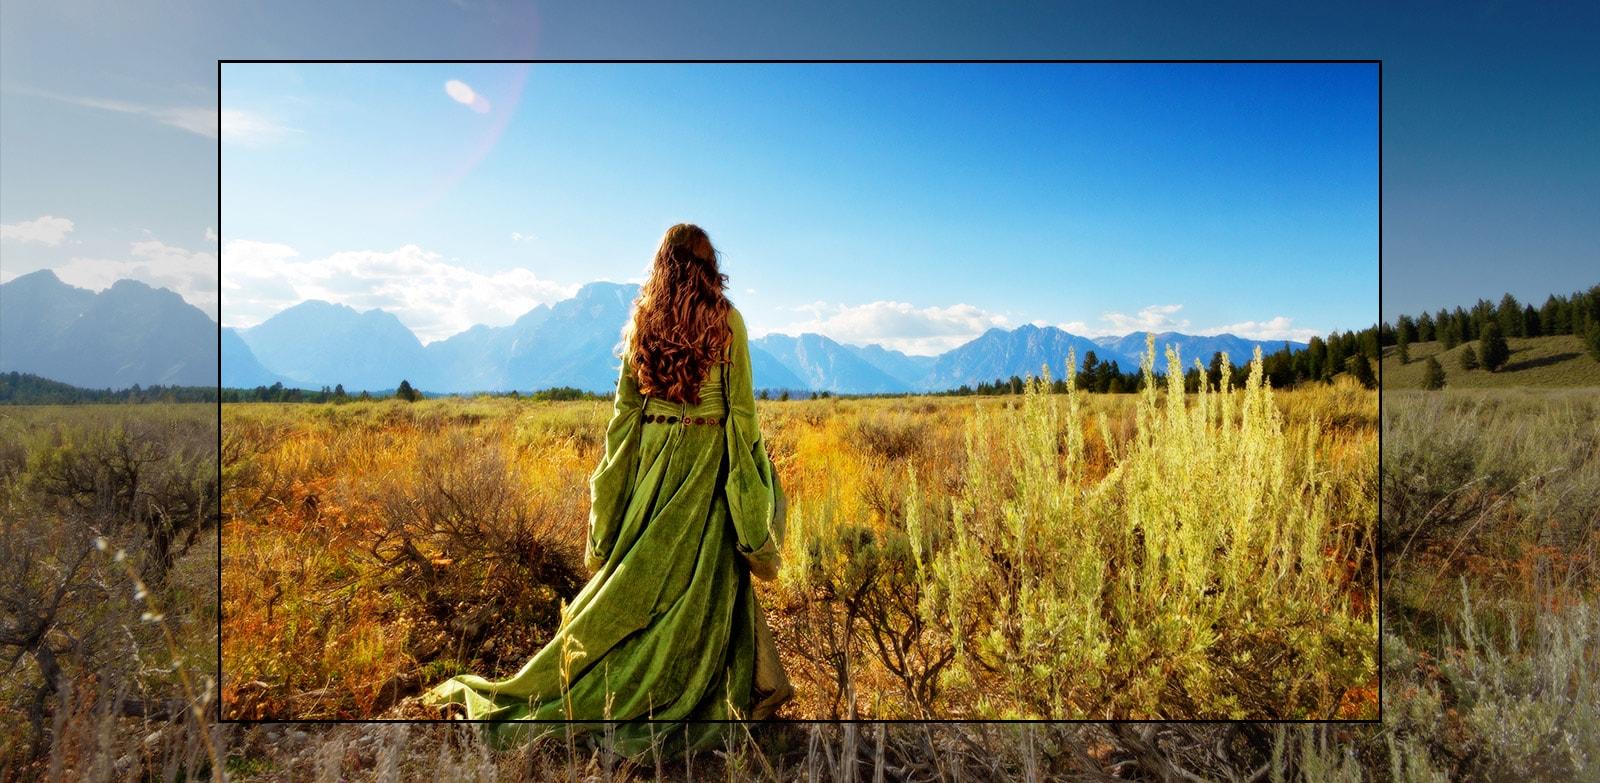 https://www.lg.com/hu/images/televiziok/md07502471/features/TV-UHD-04-Cinema-Desktop.jpg